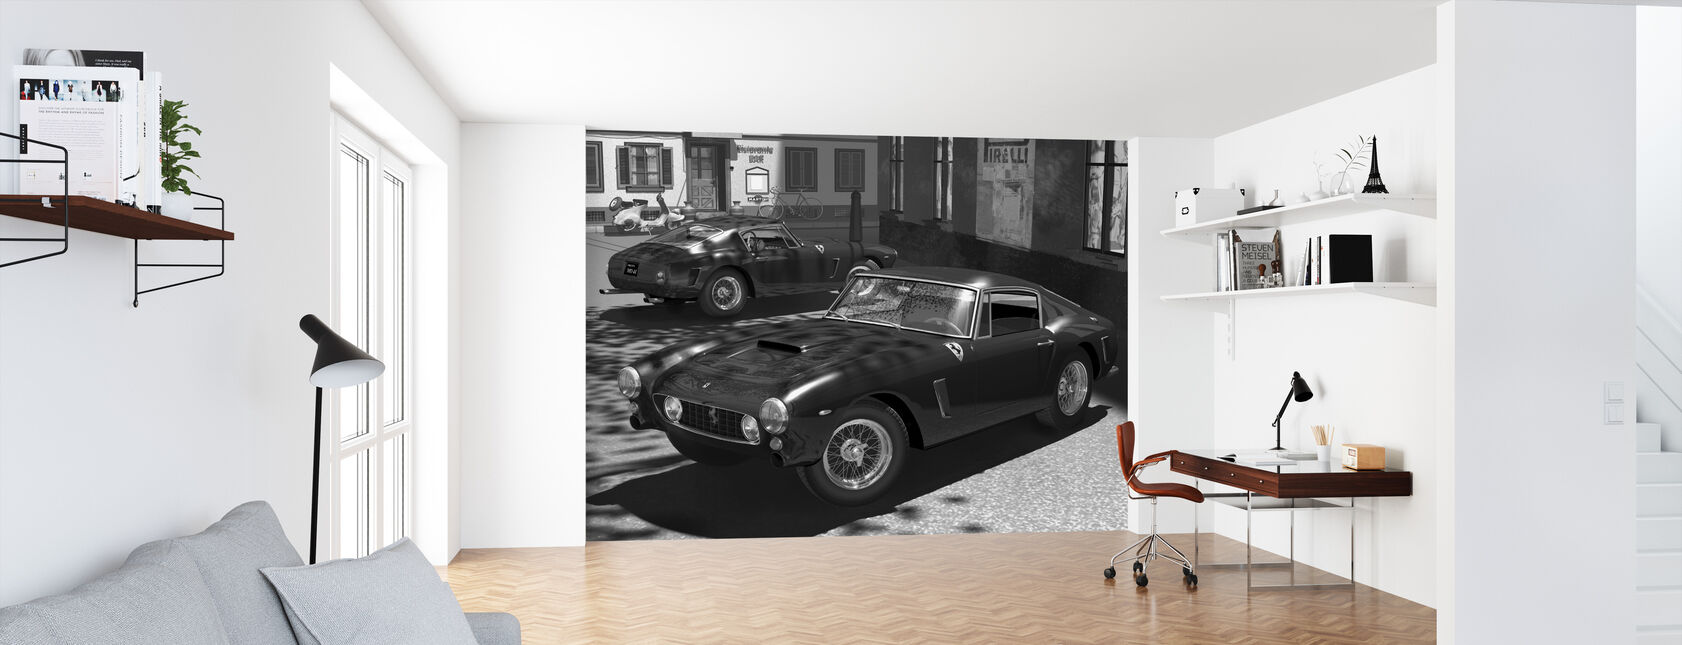 Classic Sports Car BW - Wallpaper - Office